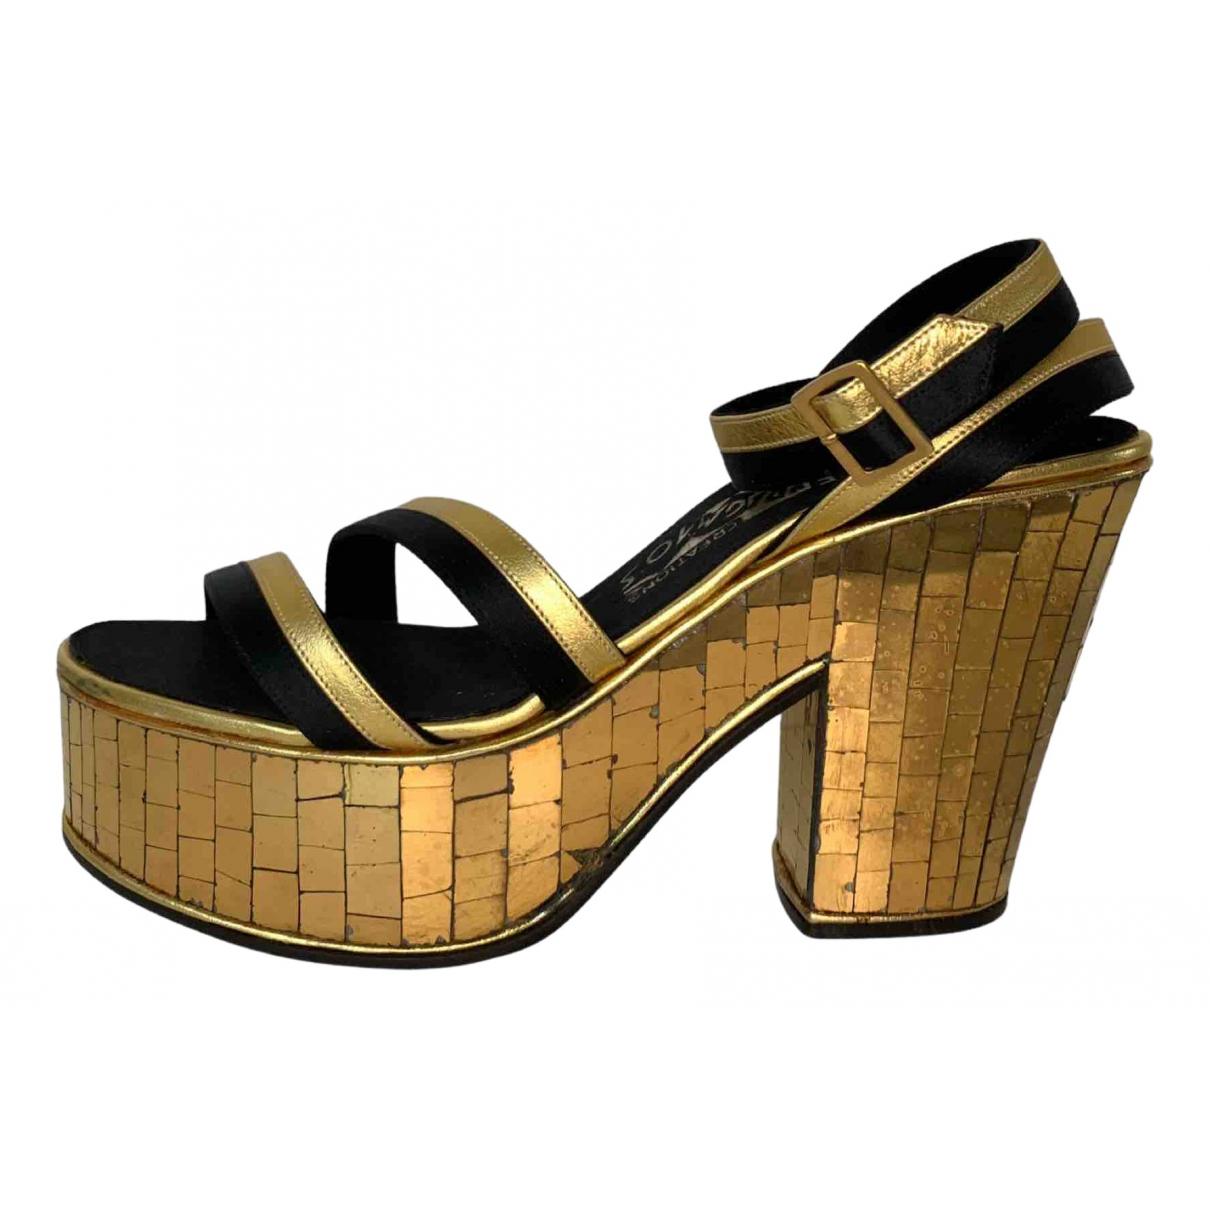 Salvatore Ferragamo \N Gold Leather Sandals for Women 7 US